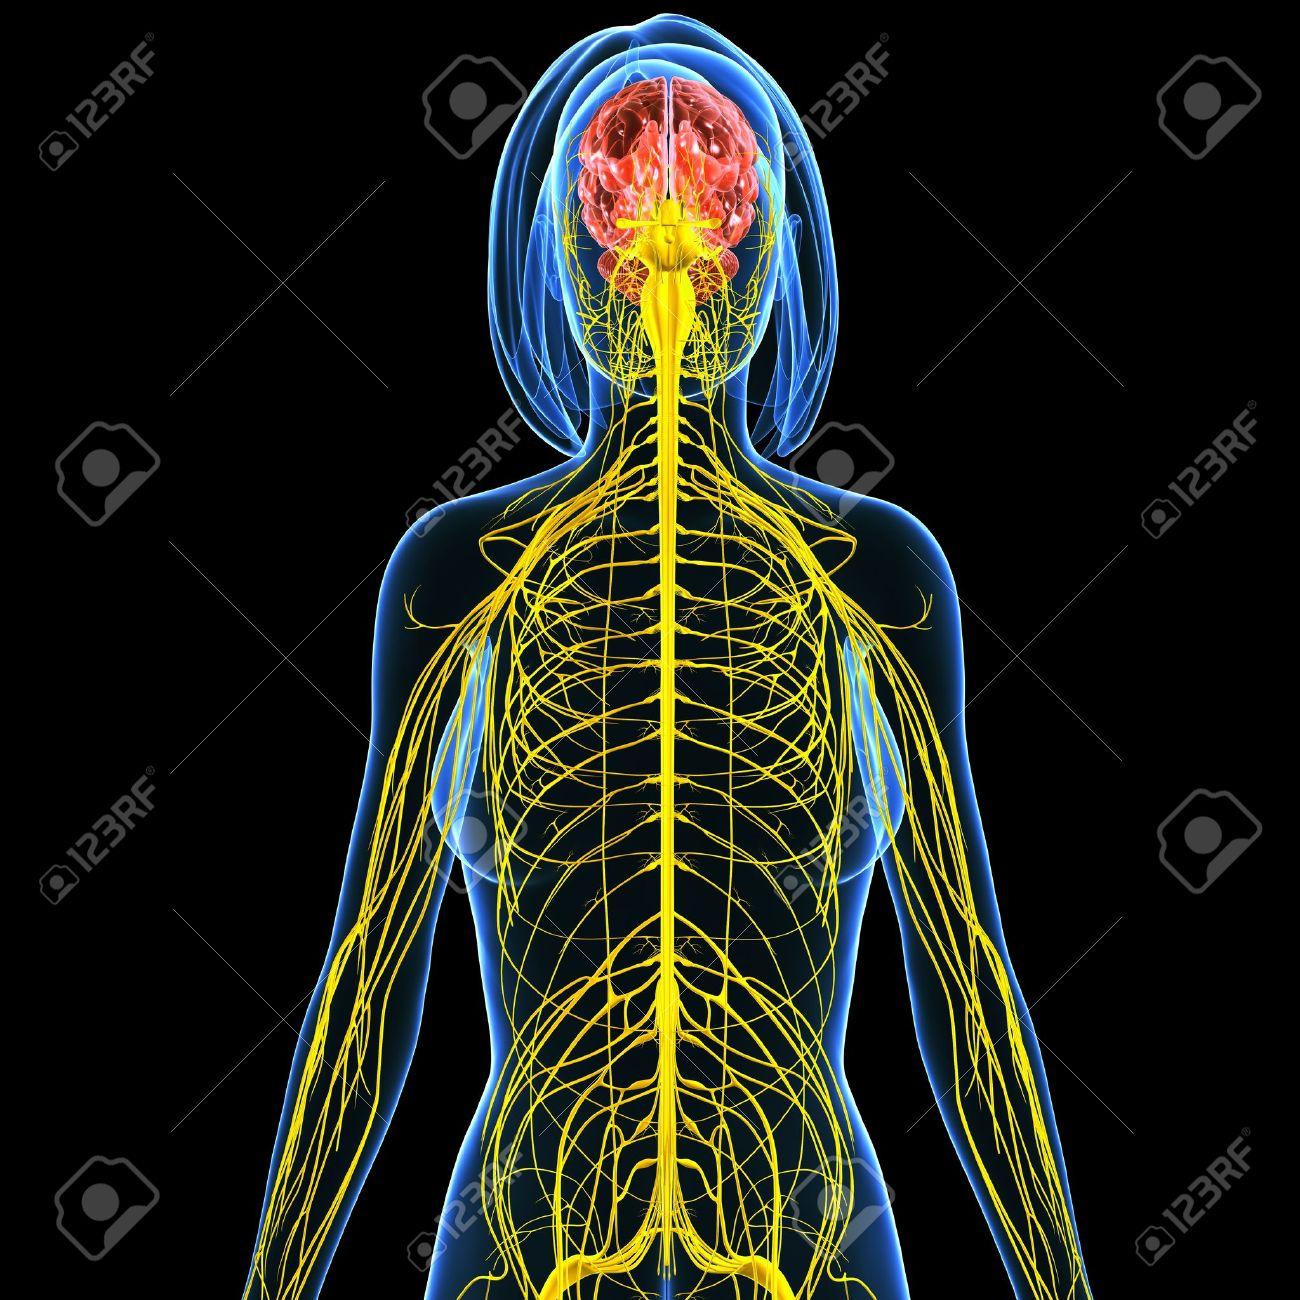 3d Art Illustration Of Nervous System Of Female Back View Stock